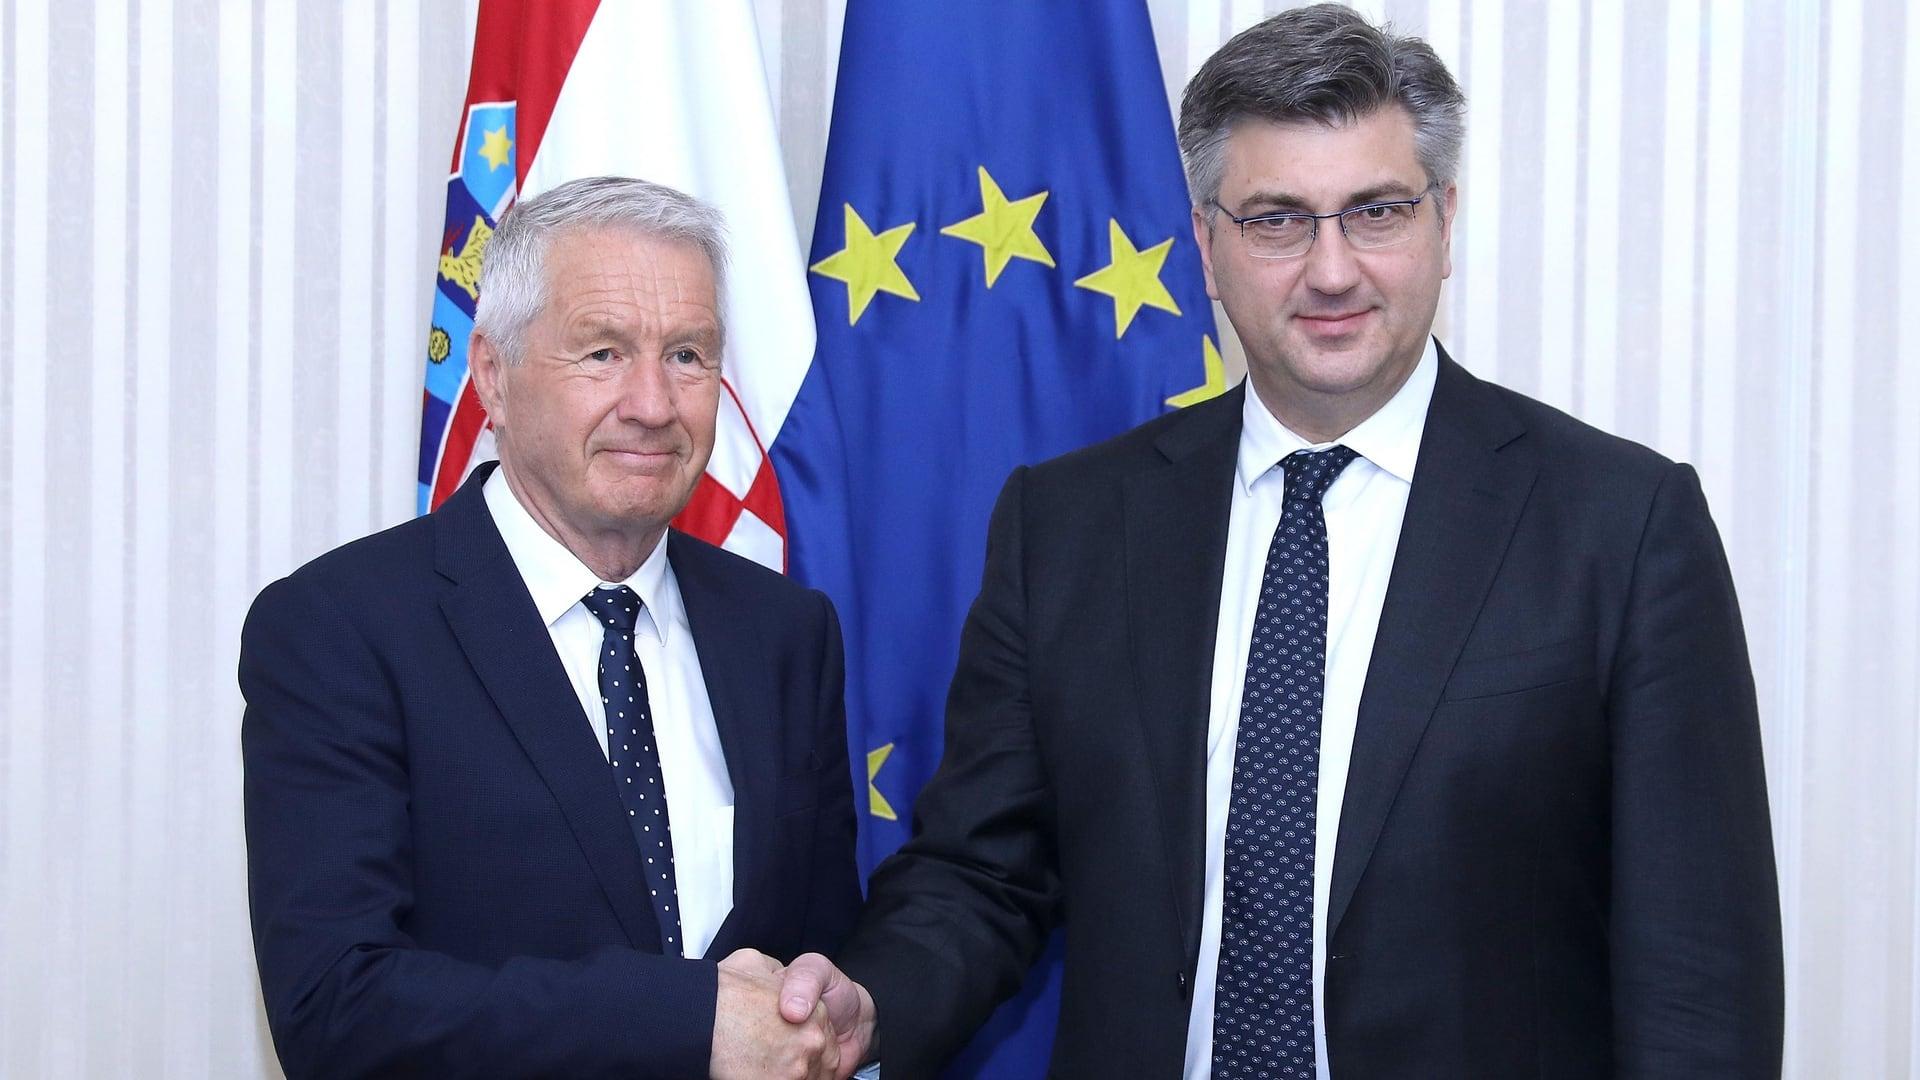 National minorities' rights: Croatia praised by CoE's Jagland